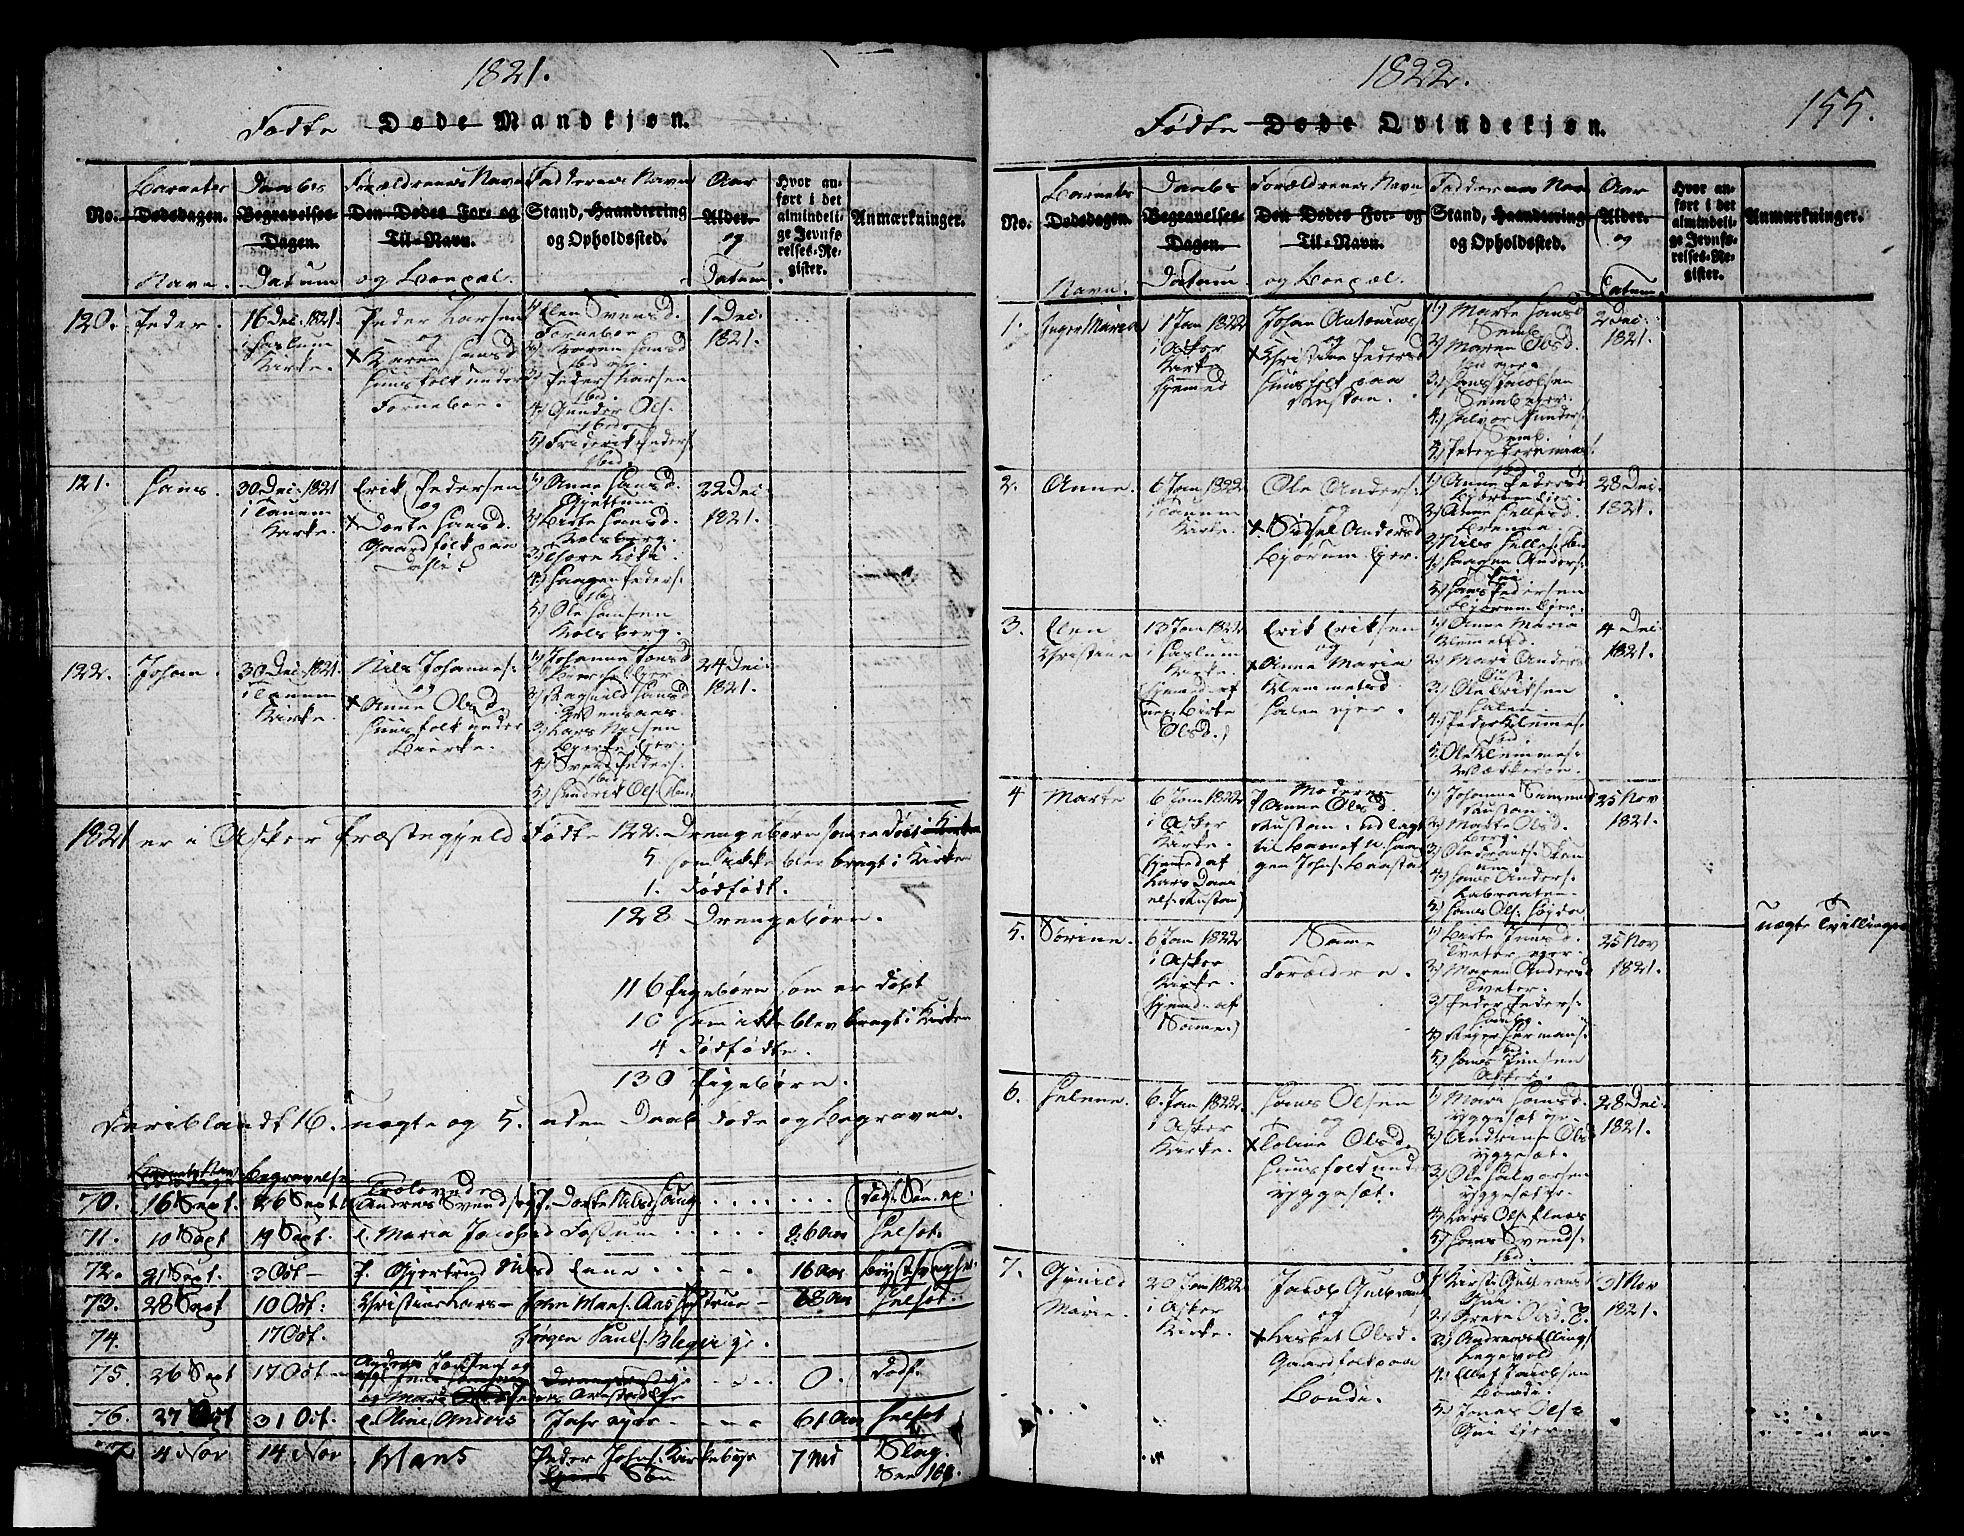 SAO, Asker prestekontor Kirkebøker, G/Ga/L0001: Klokkerbok nr. I 1, 1814-1830, s. 155